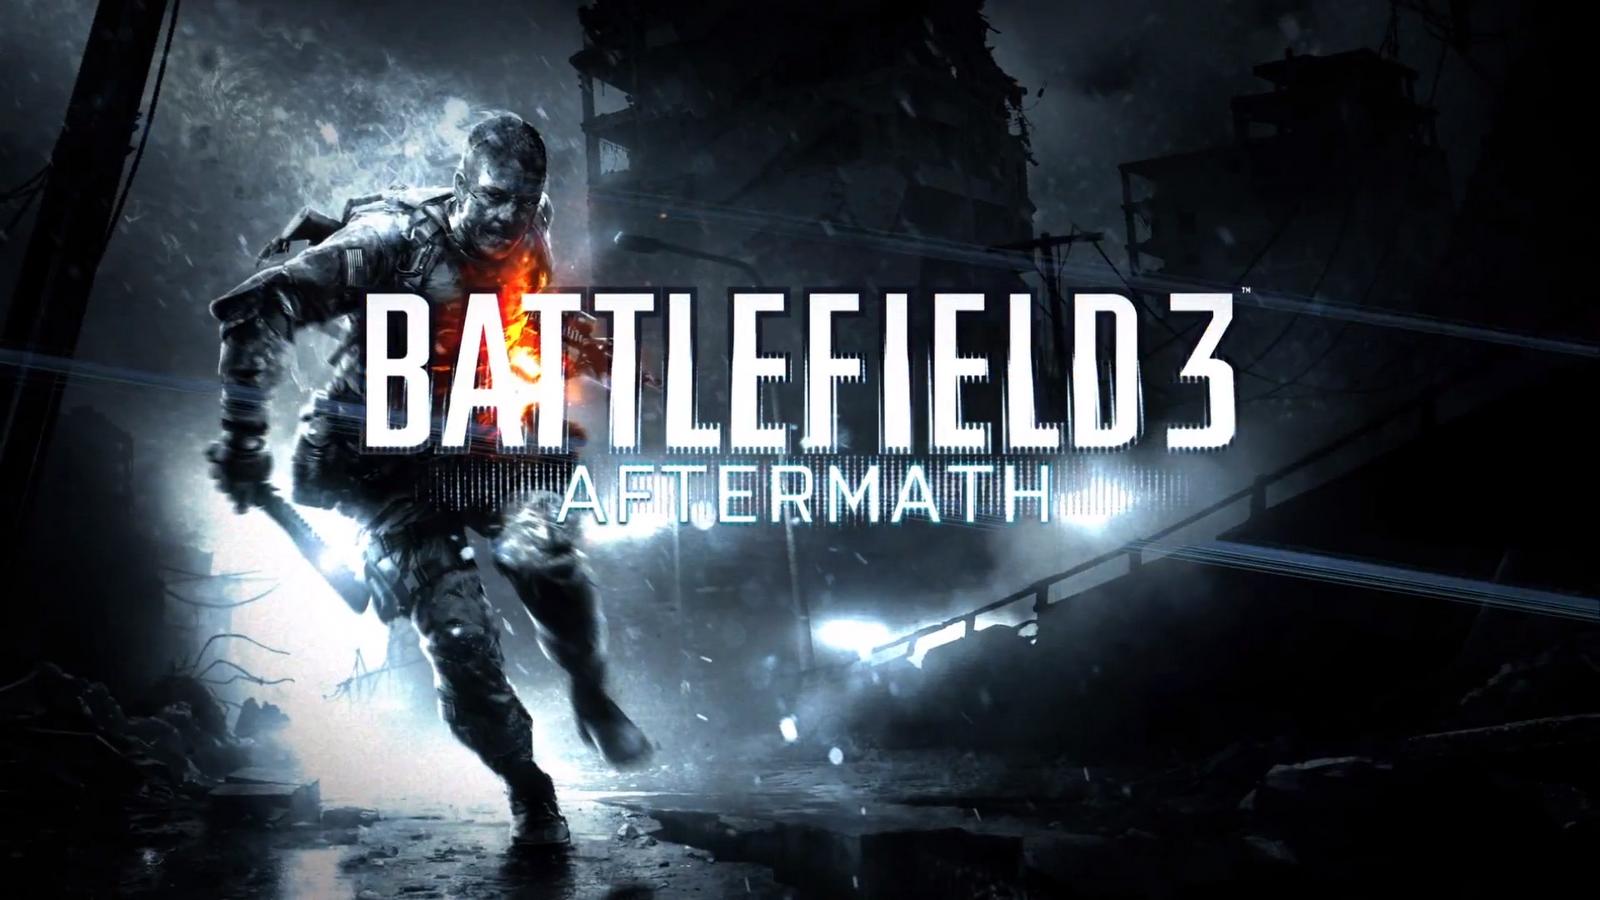 battlefield 3 aftermath wallpapers - Battlefield 3 Aftermath Wallpapers Full HD